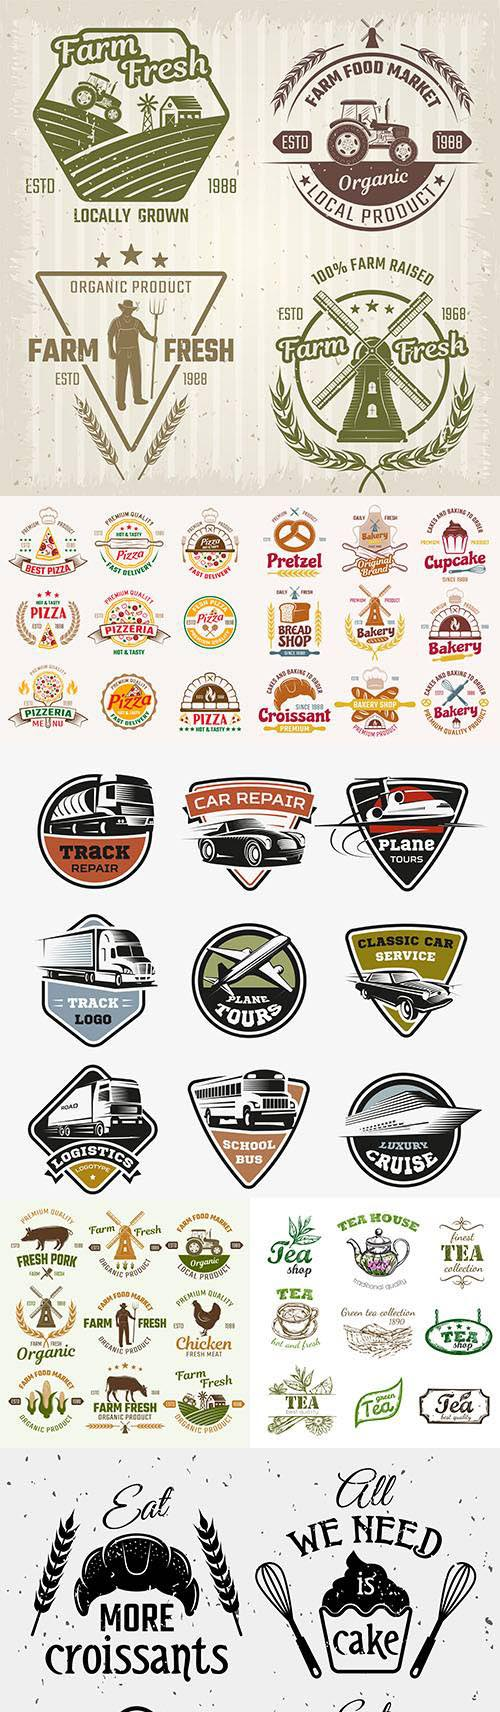 Vintage logo and emblem brand Name Company design 3